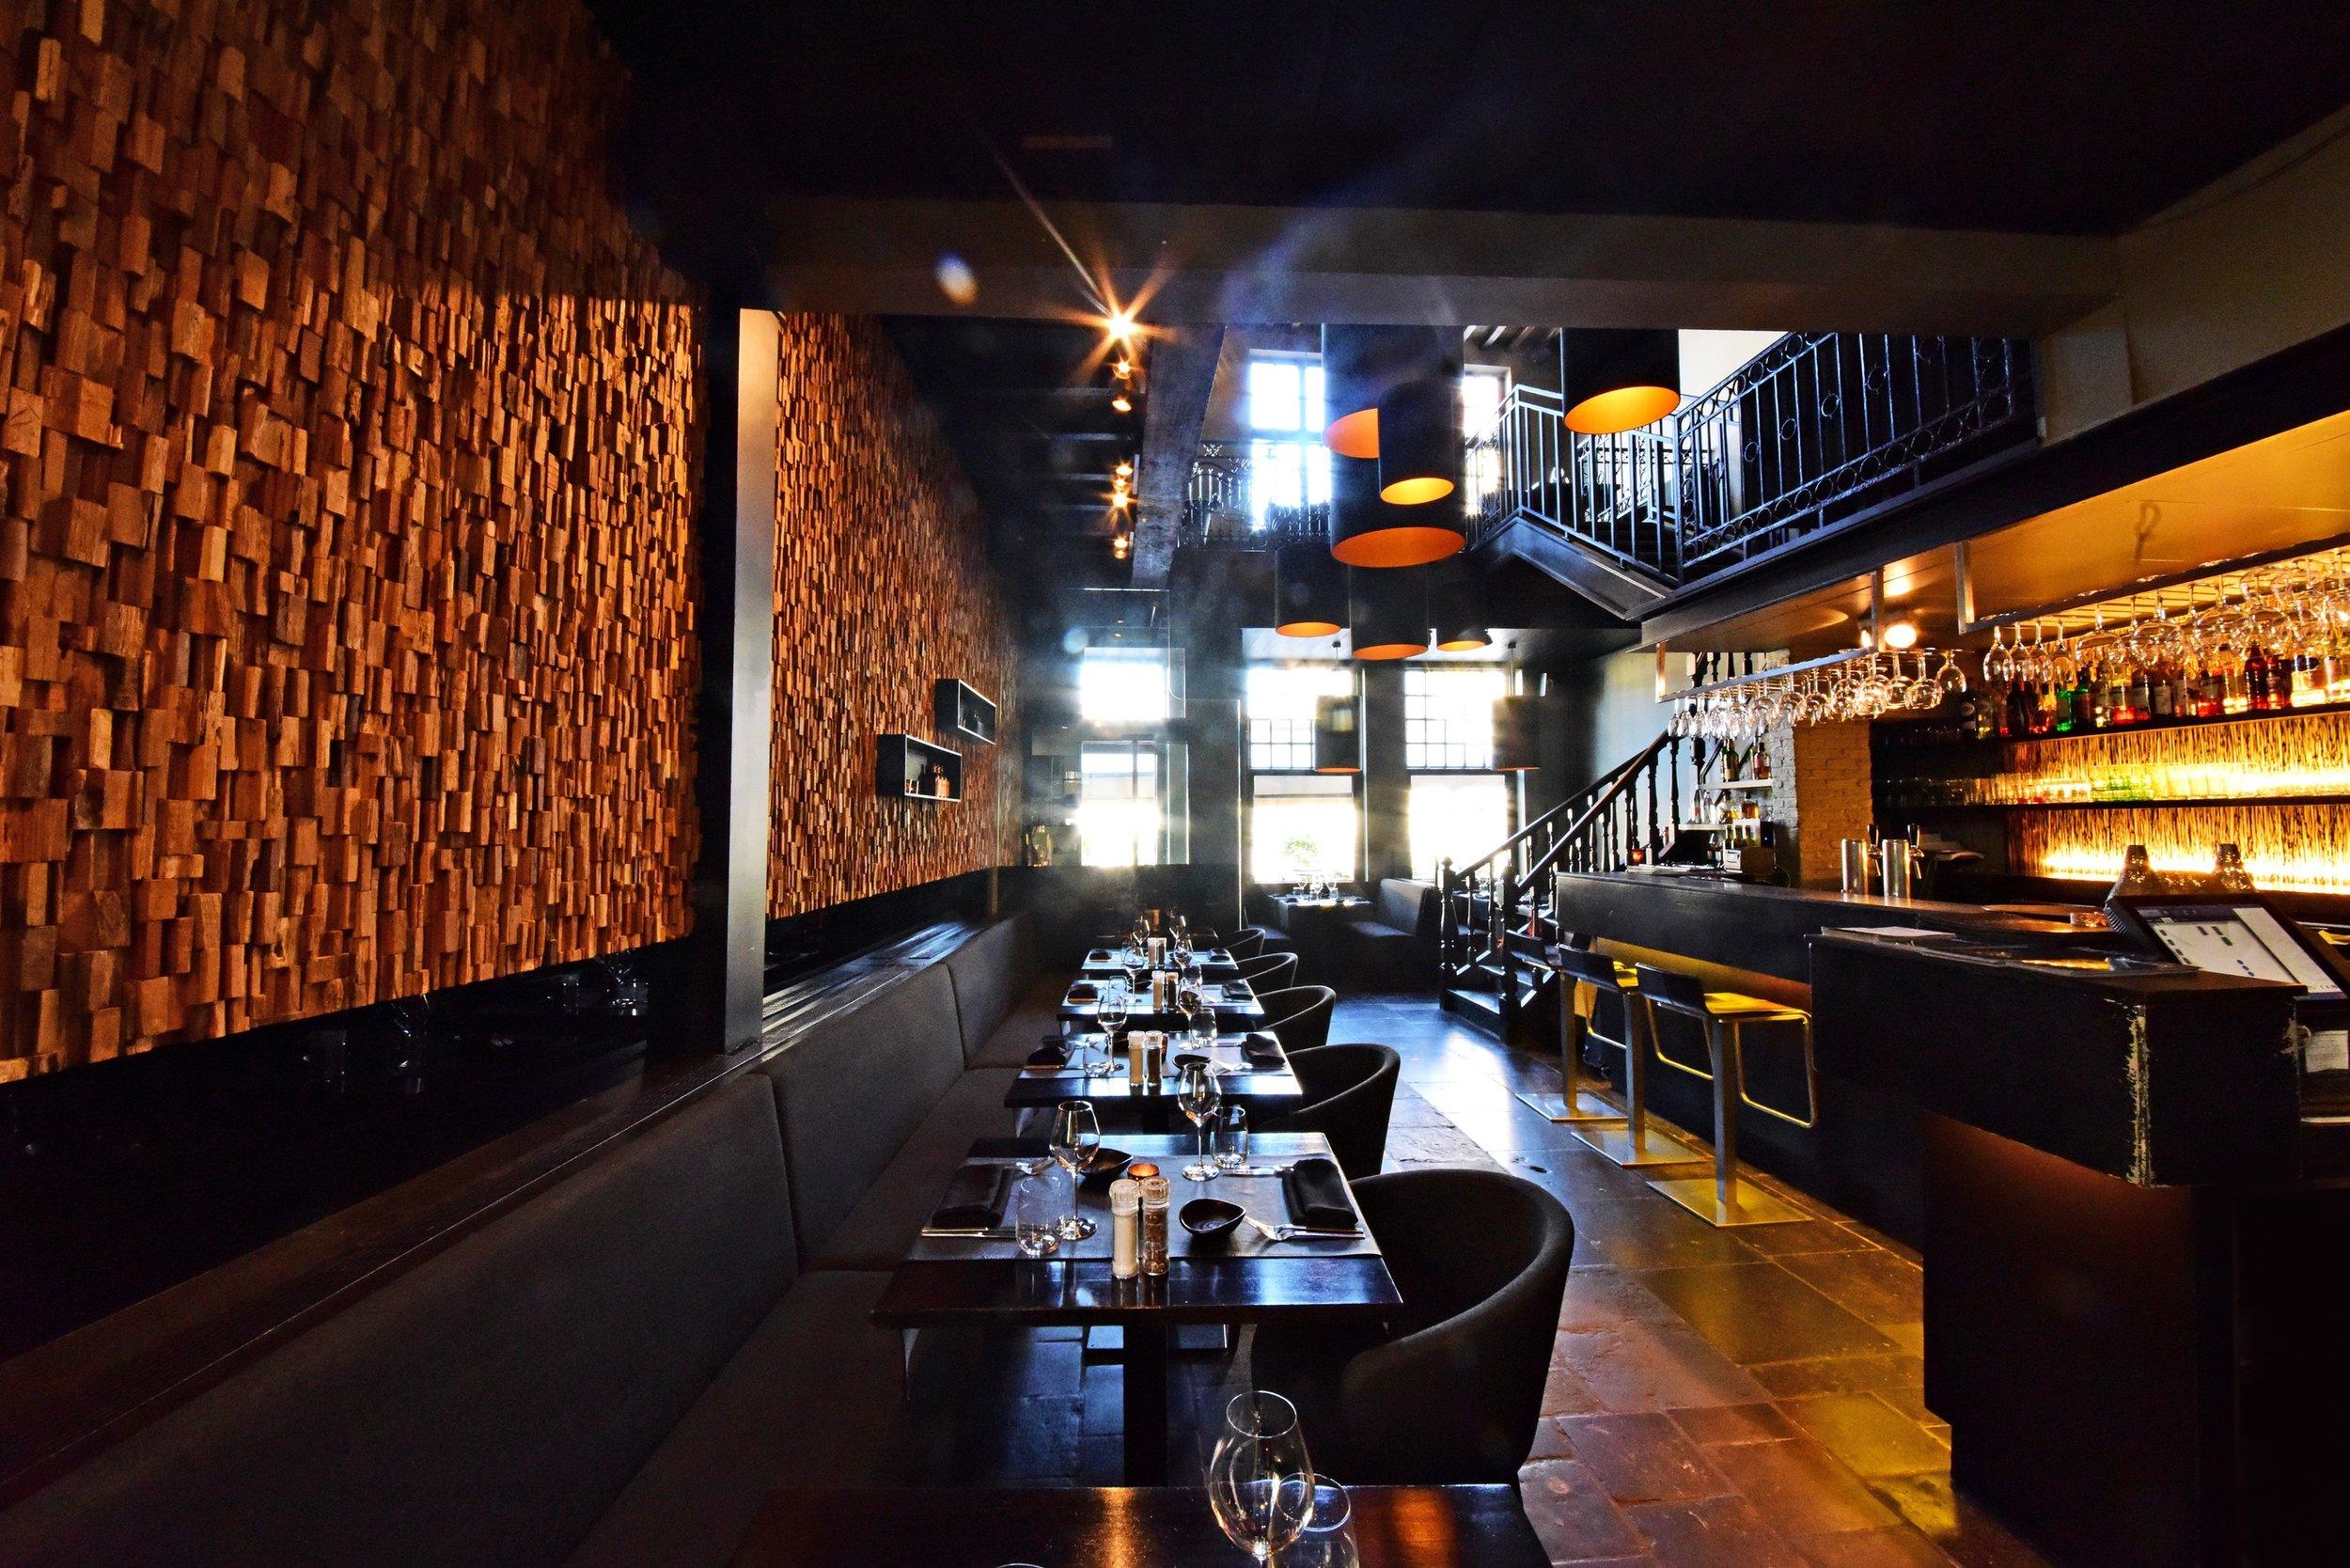 4 brasserie restaurant barleys barley's dendermonde grote markt bart albrecht tablefever.jpg